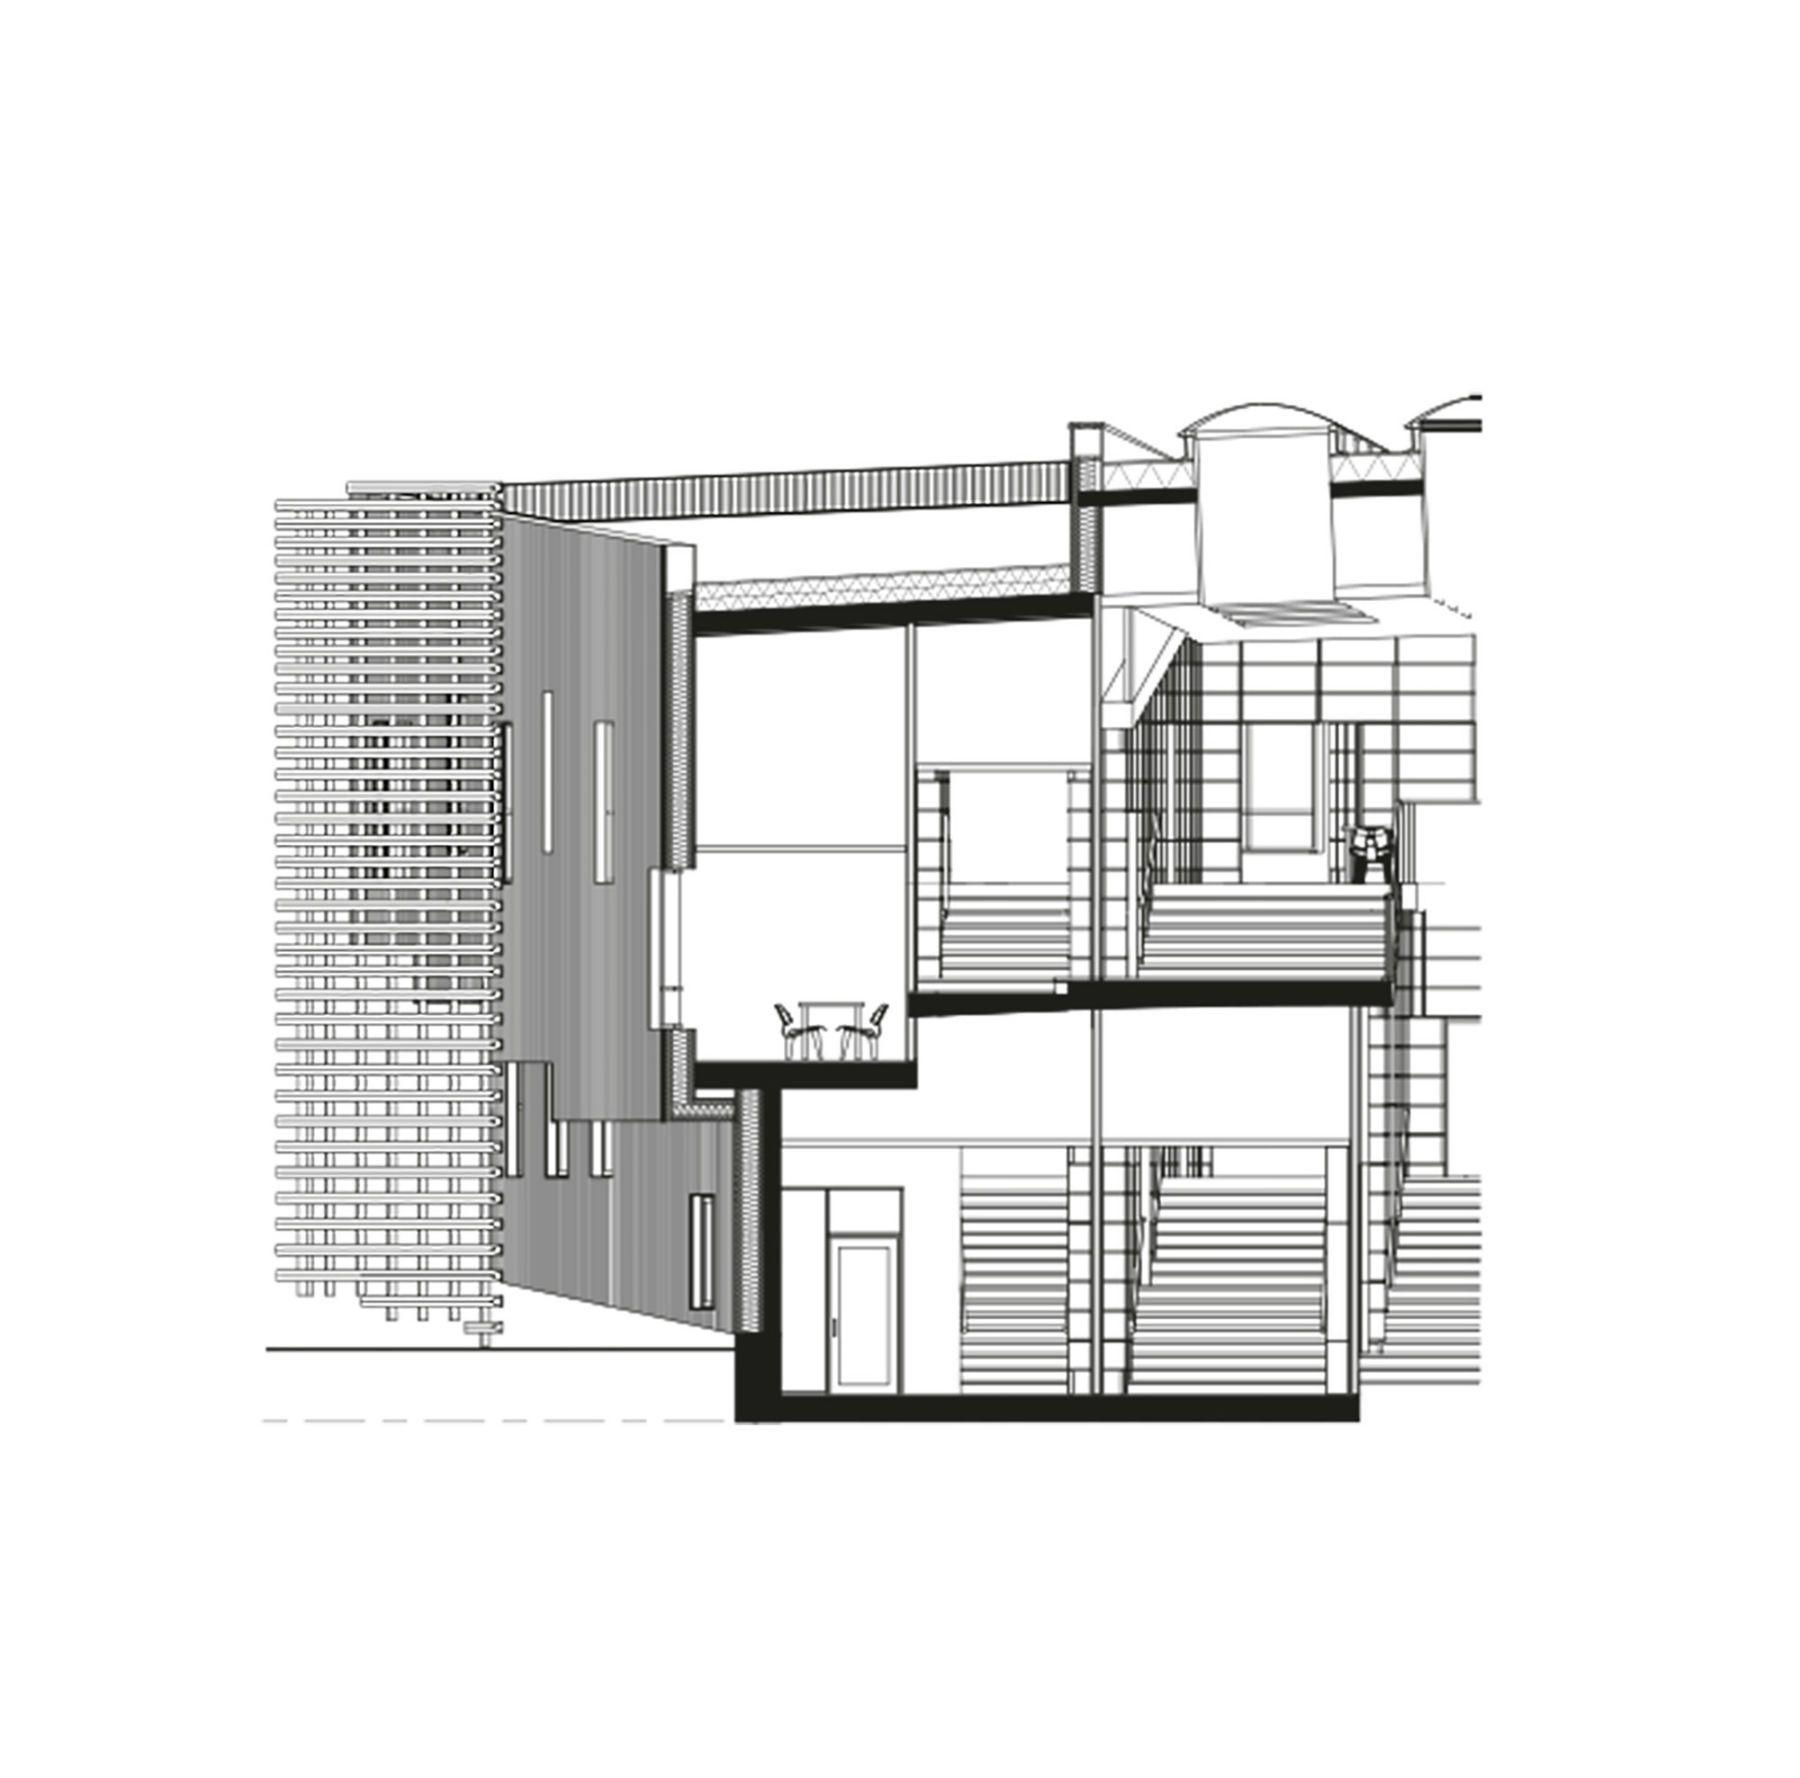 Dalarna Media Library | Architecture: Drawing Details